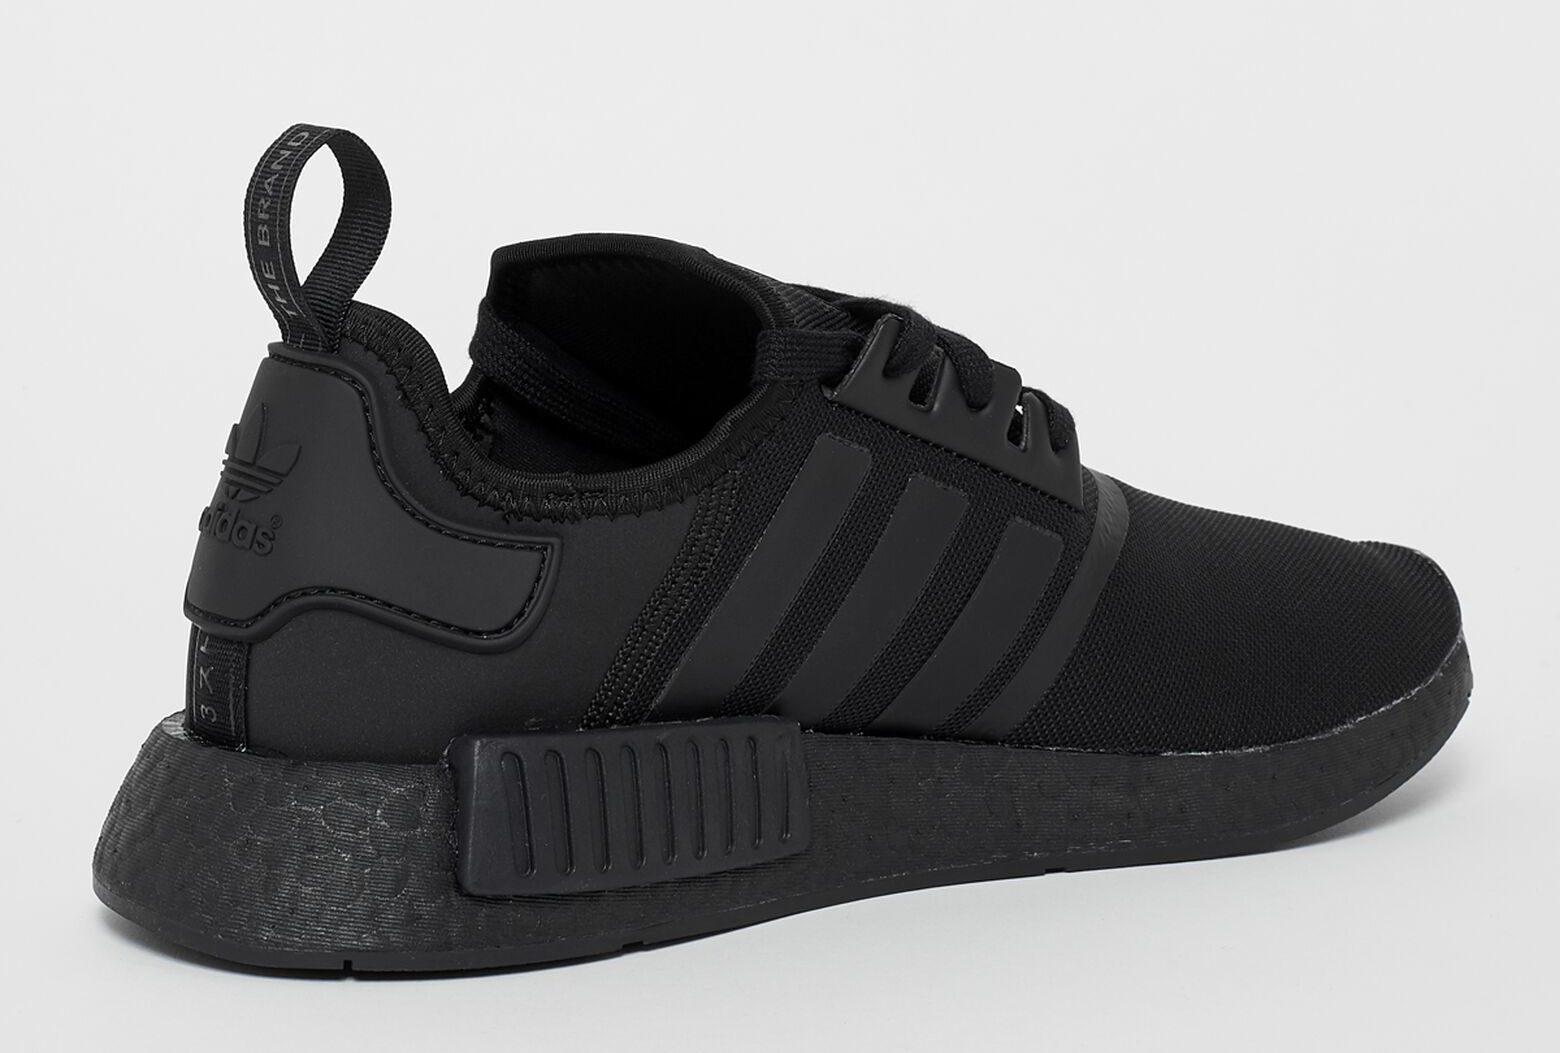 adidas originals nmd r1 sneaker  core black2Fcore black2Fcore black  hinten e1630144339946